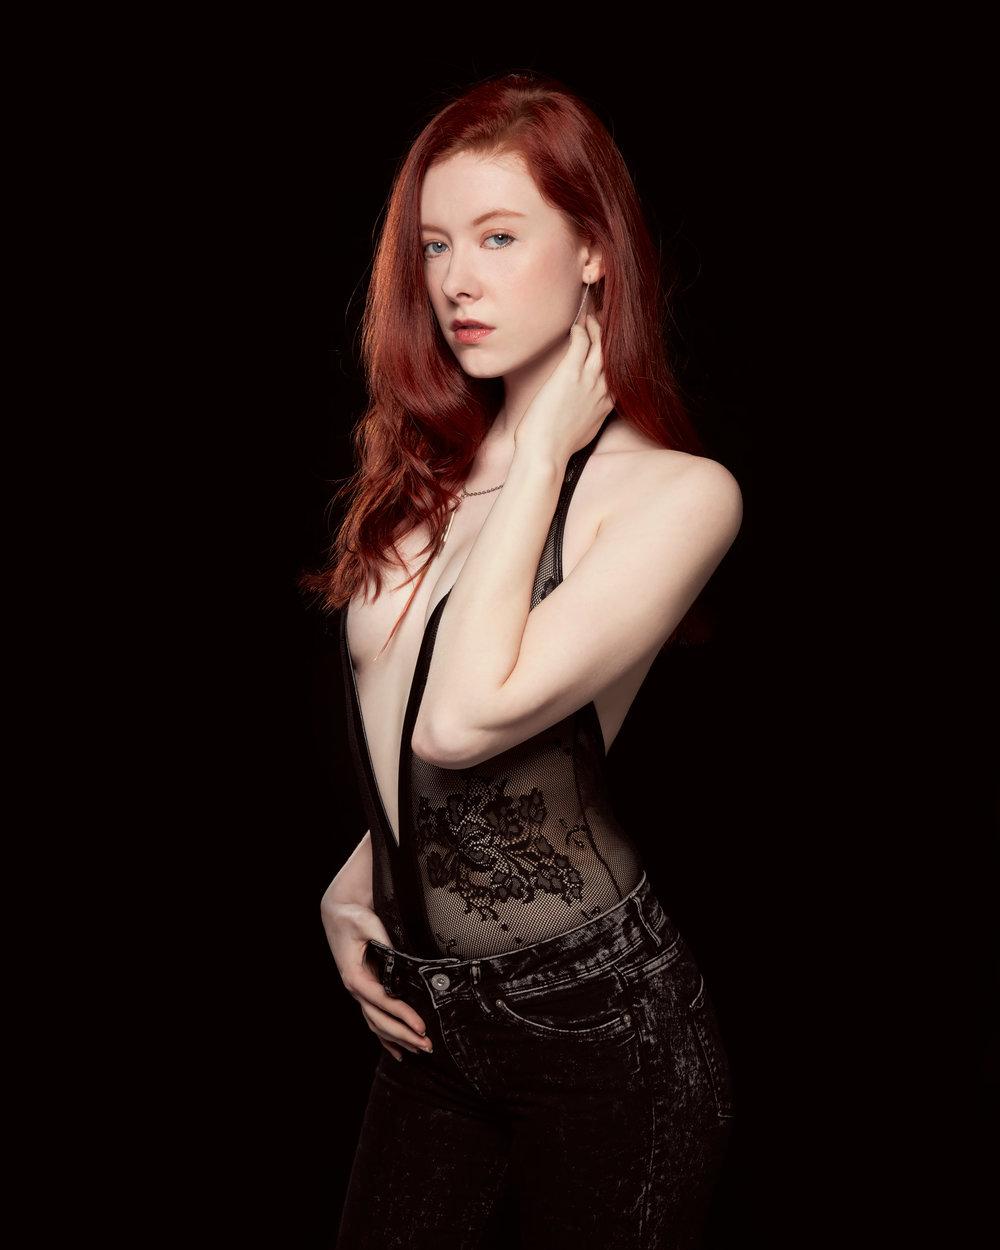 Hannah Caitriona, Model & DJ